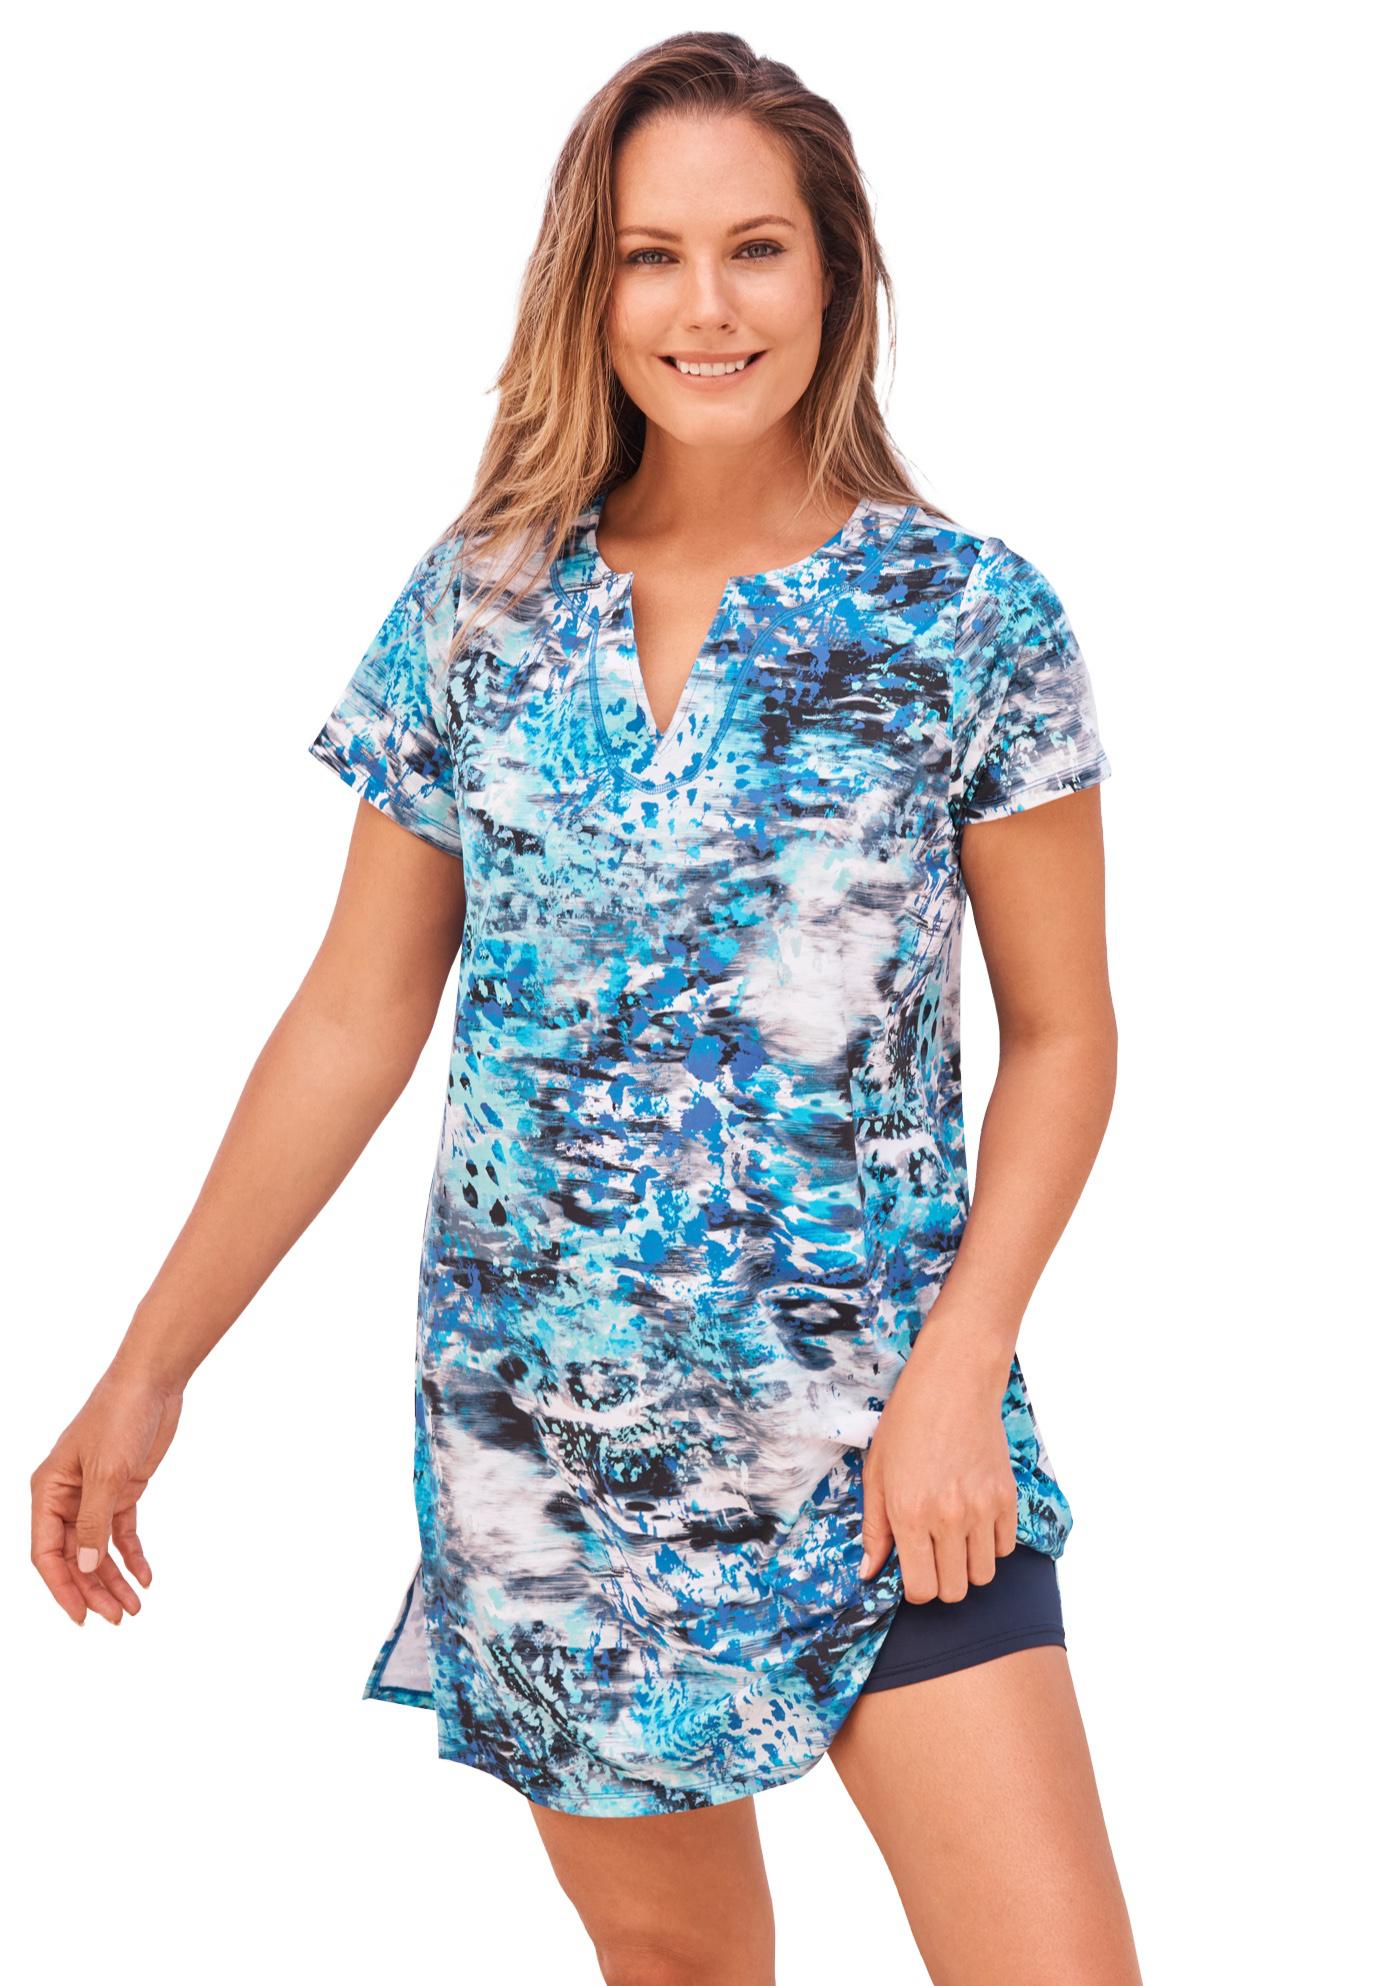 Plus Size Women's Longer Length Short-Sleeve Swim Tunic by Swim 365 in Blue Abstract